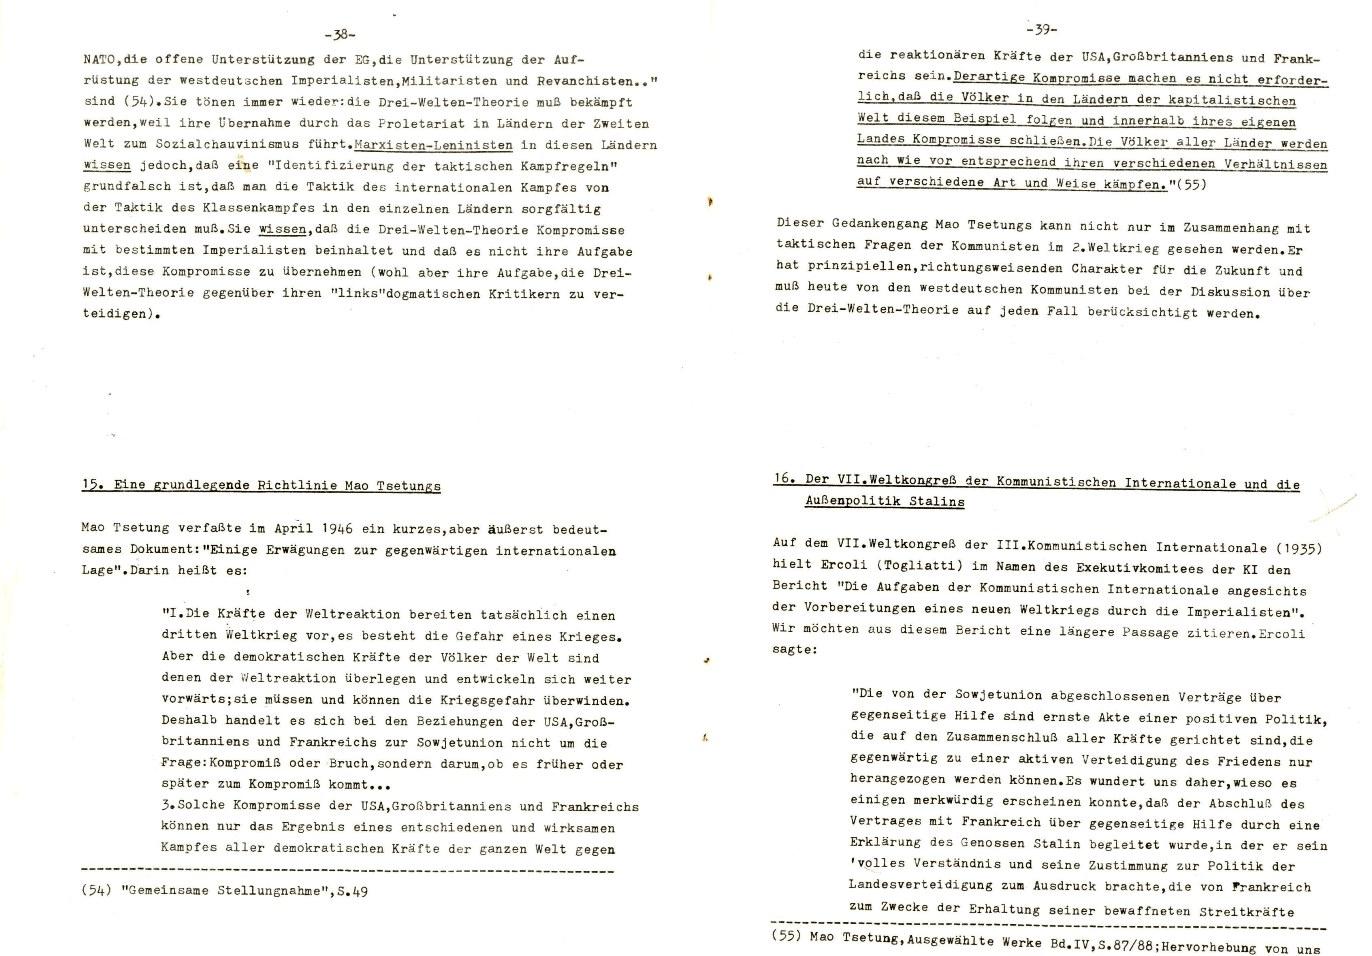 Muenchen_Kampf_dem_Revisionismus_1978_04_05_21